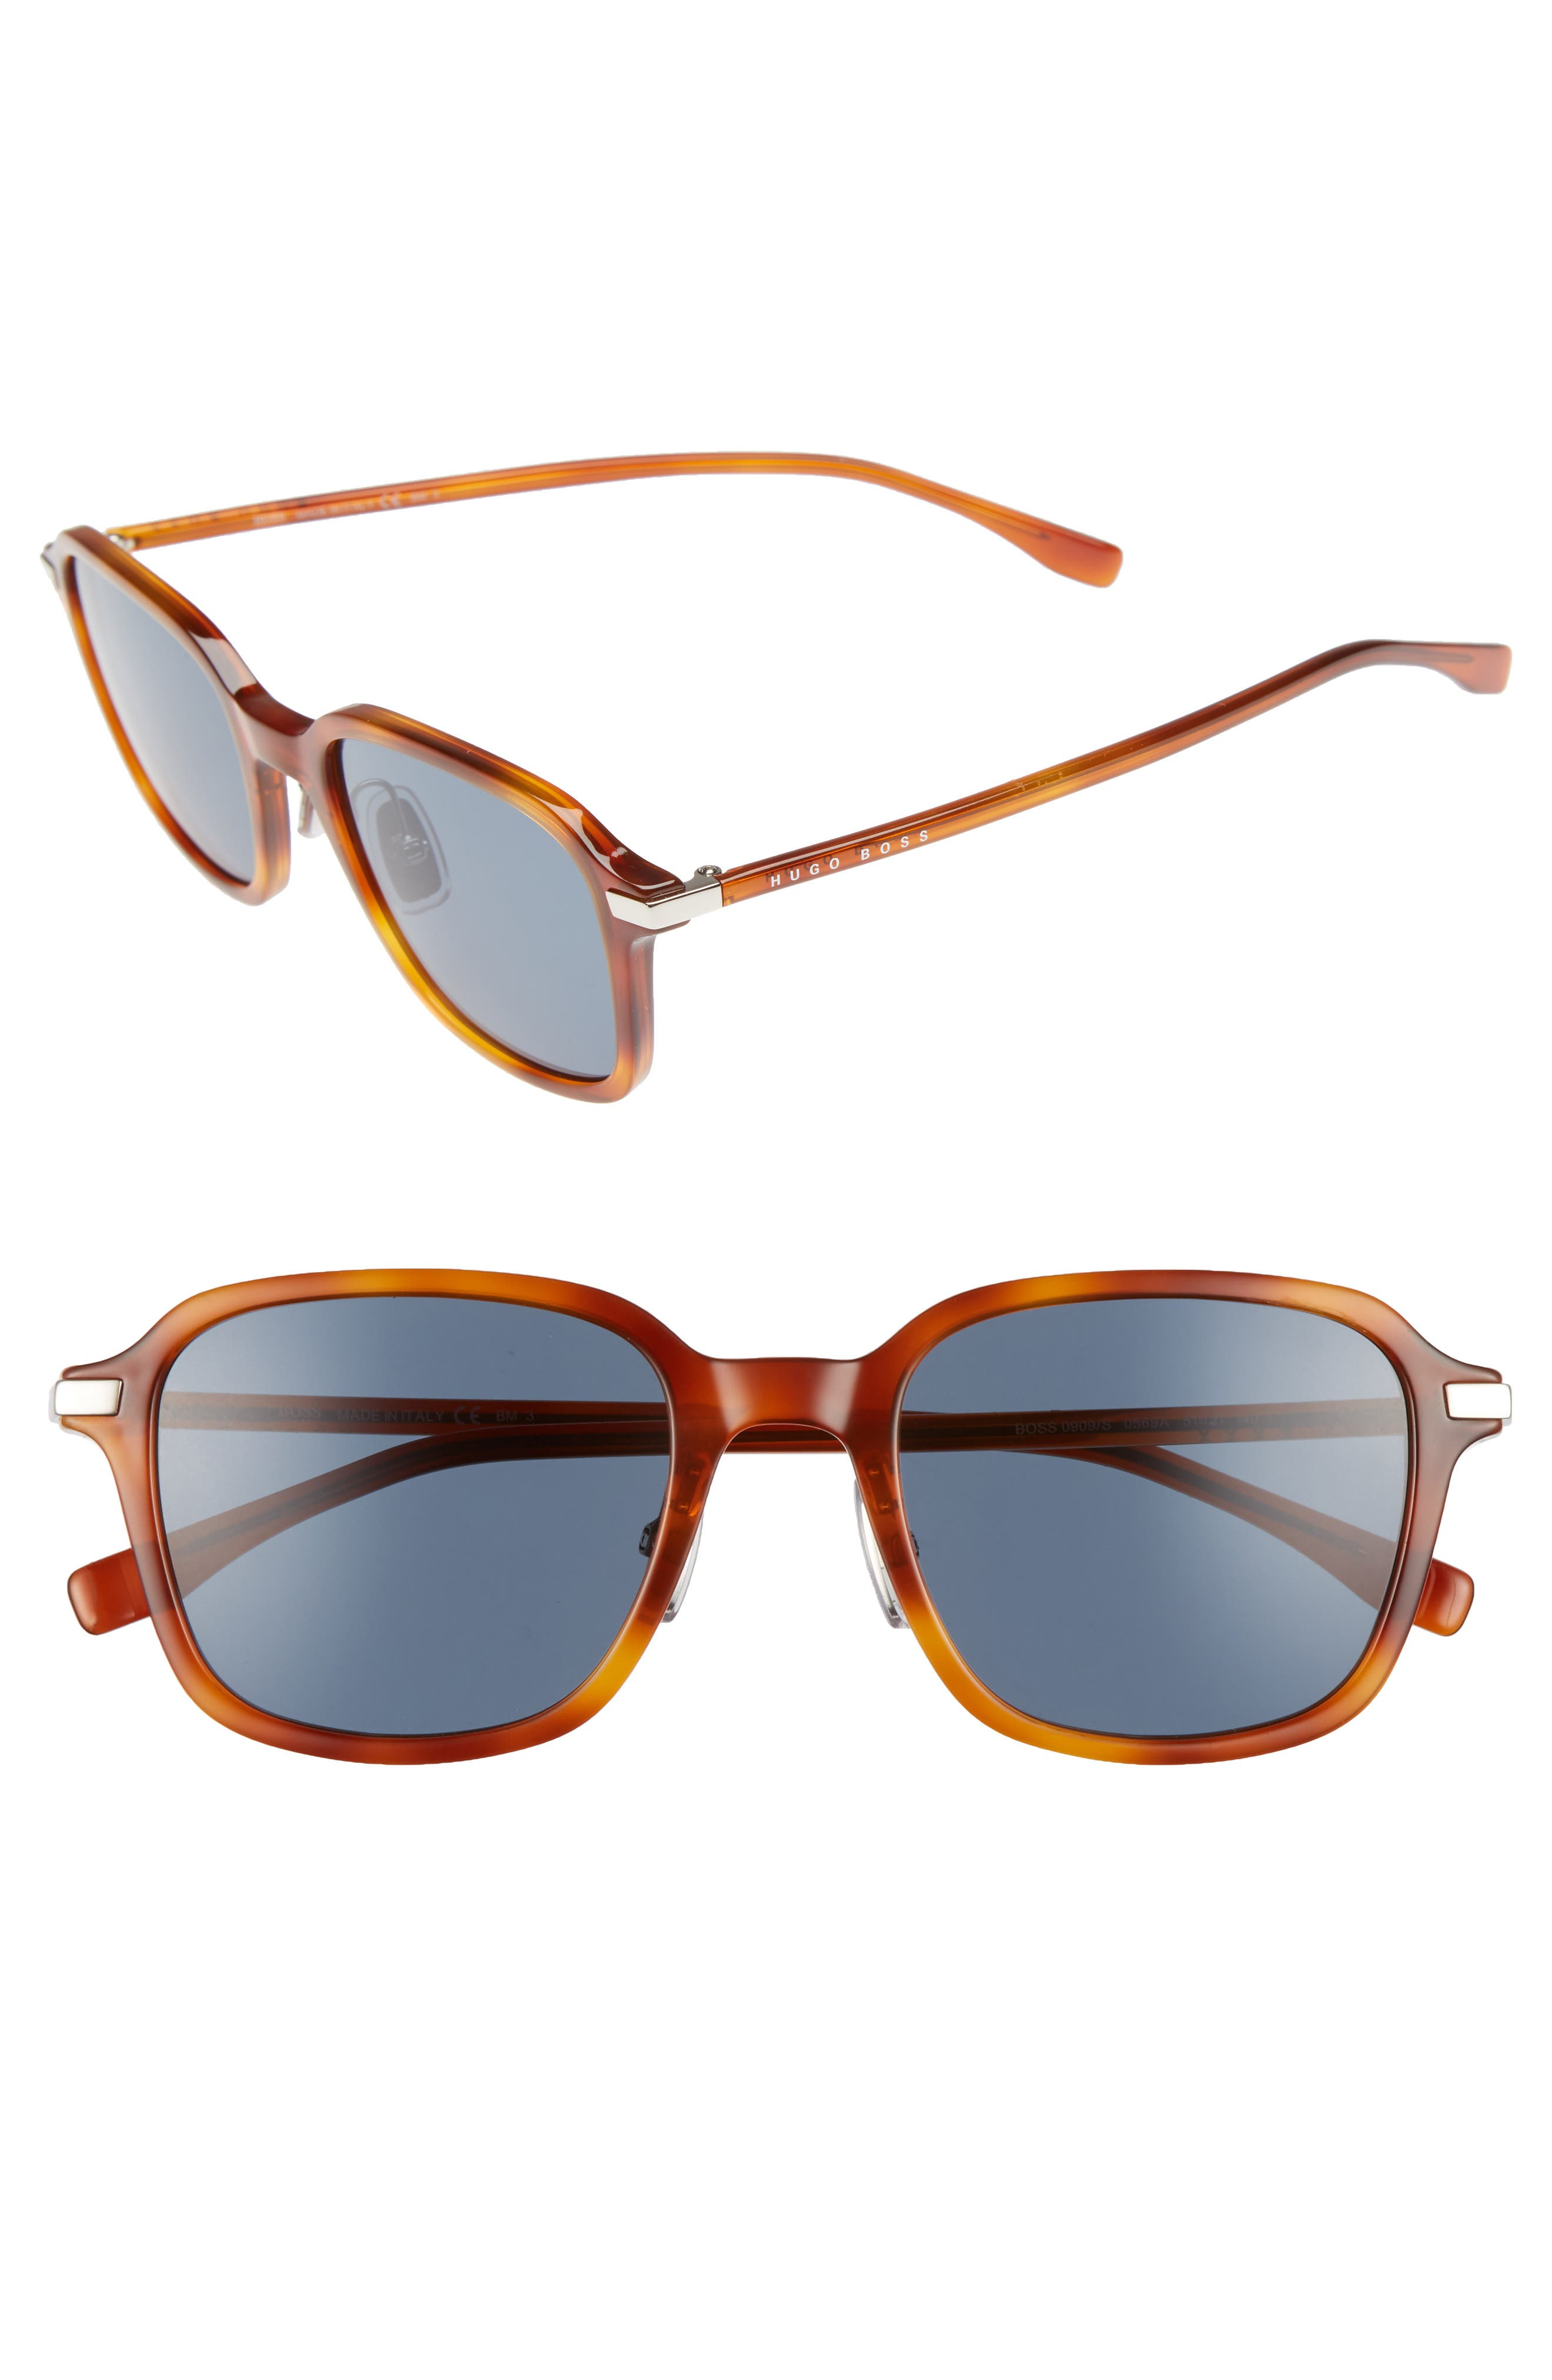 BOSS 0909S 51mm Sunglasses